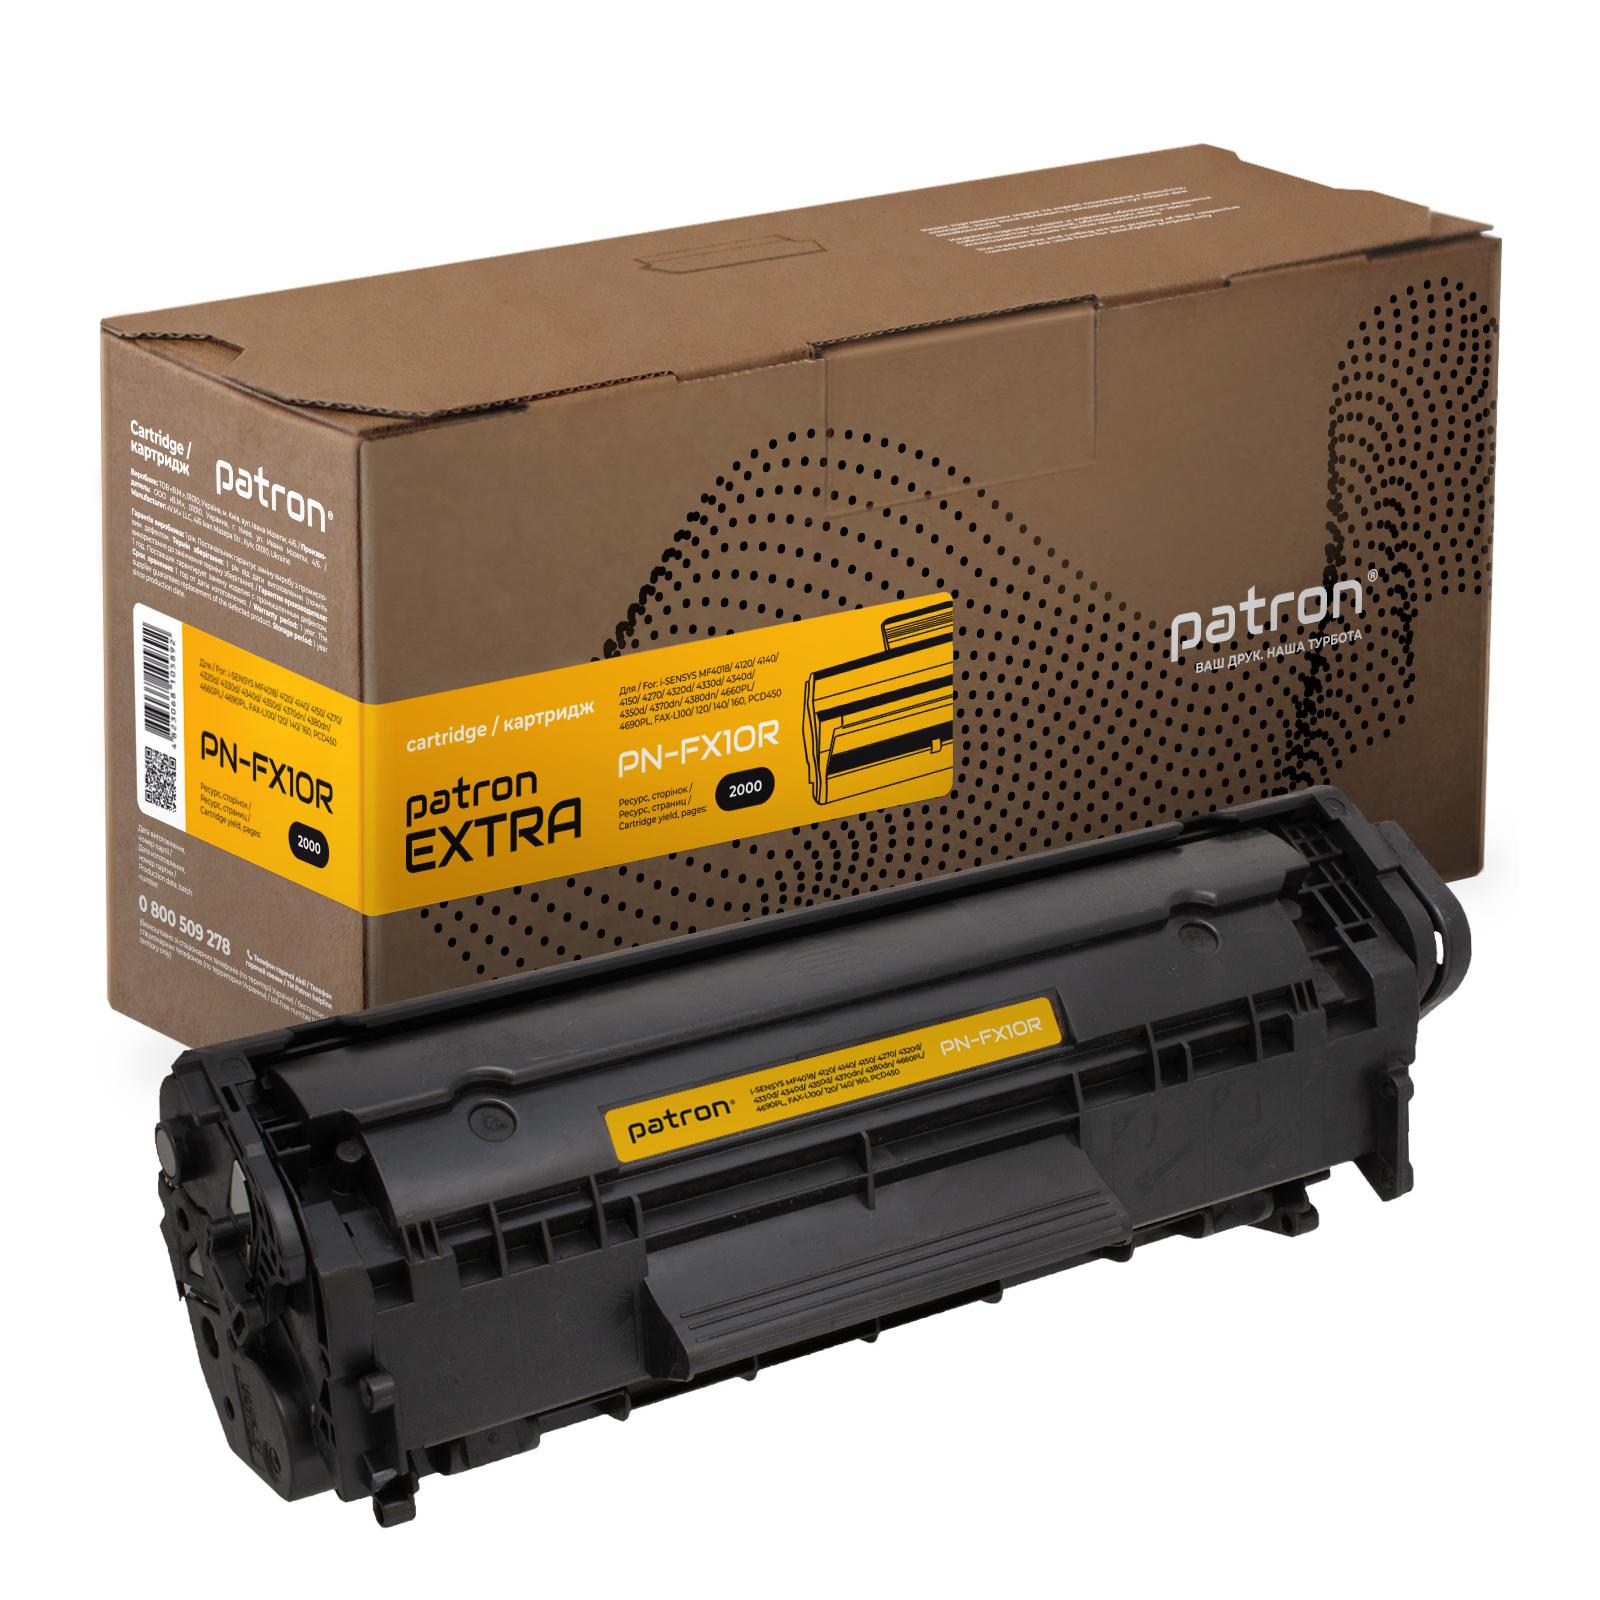 Картридж PATRON CANON FX-10 Extra(для MF4120/ 4140) (CT-CAN-FX-10-PN-R)